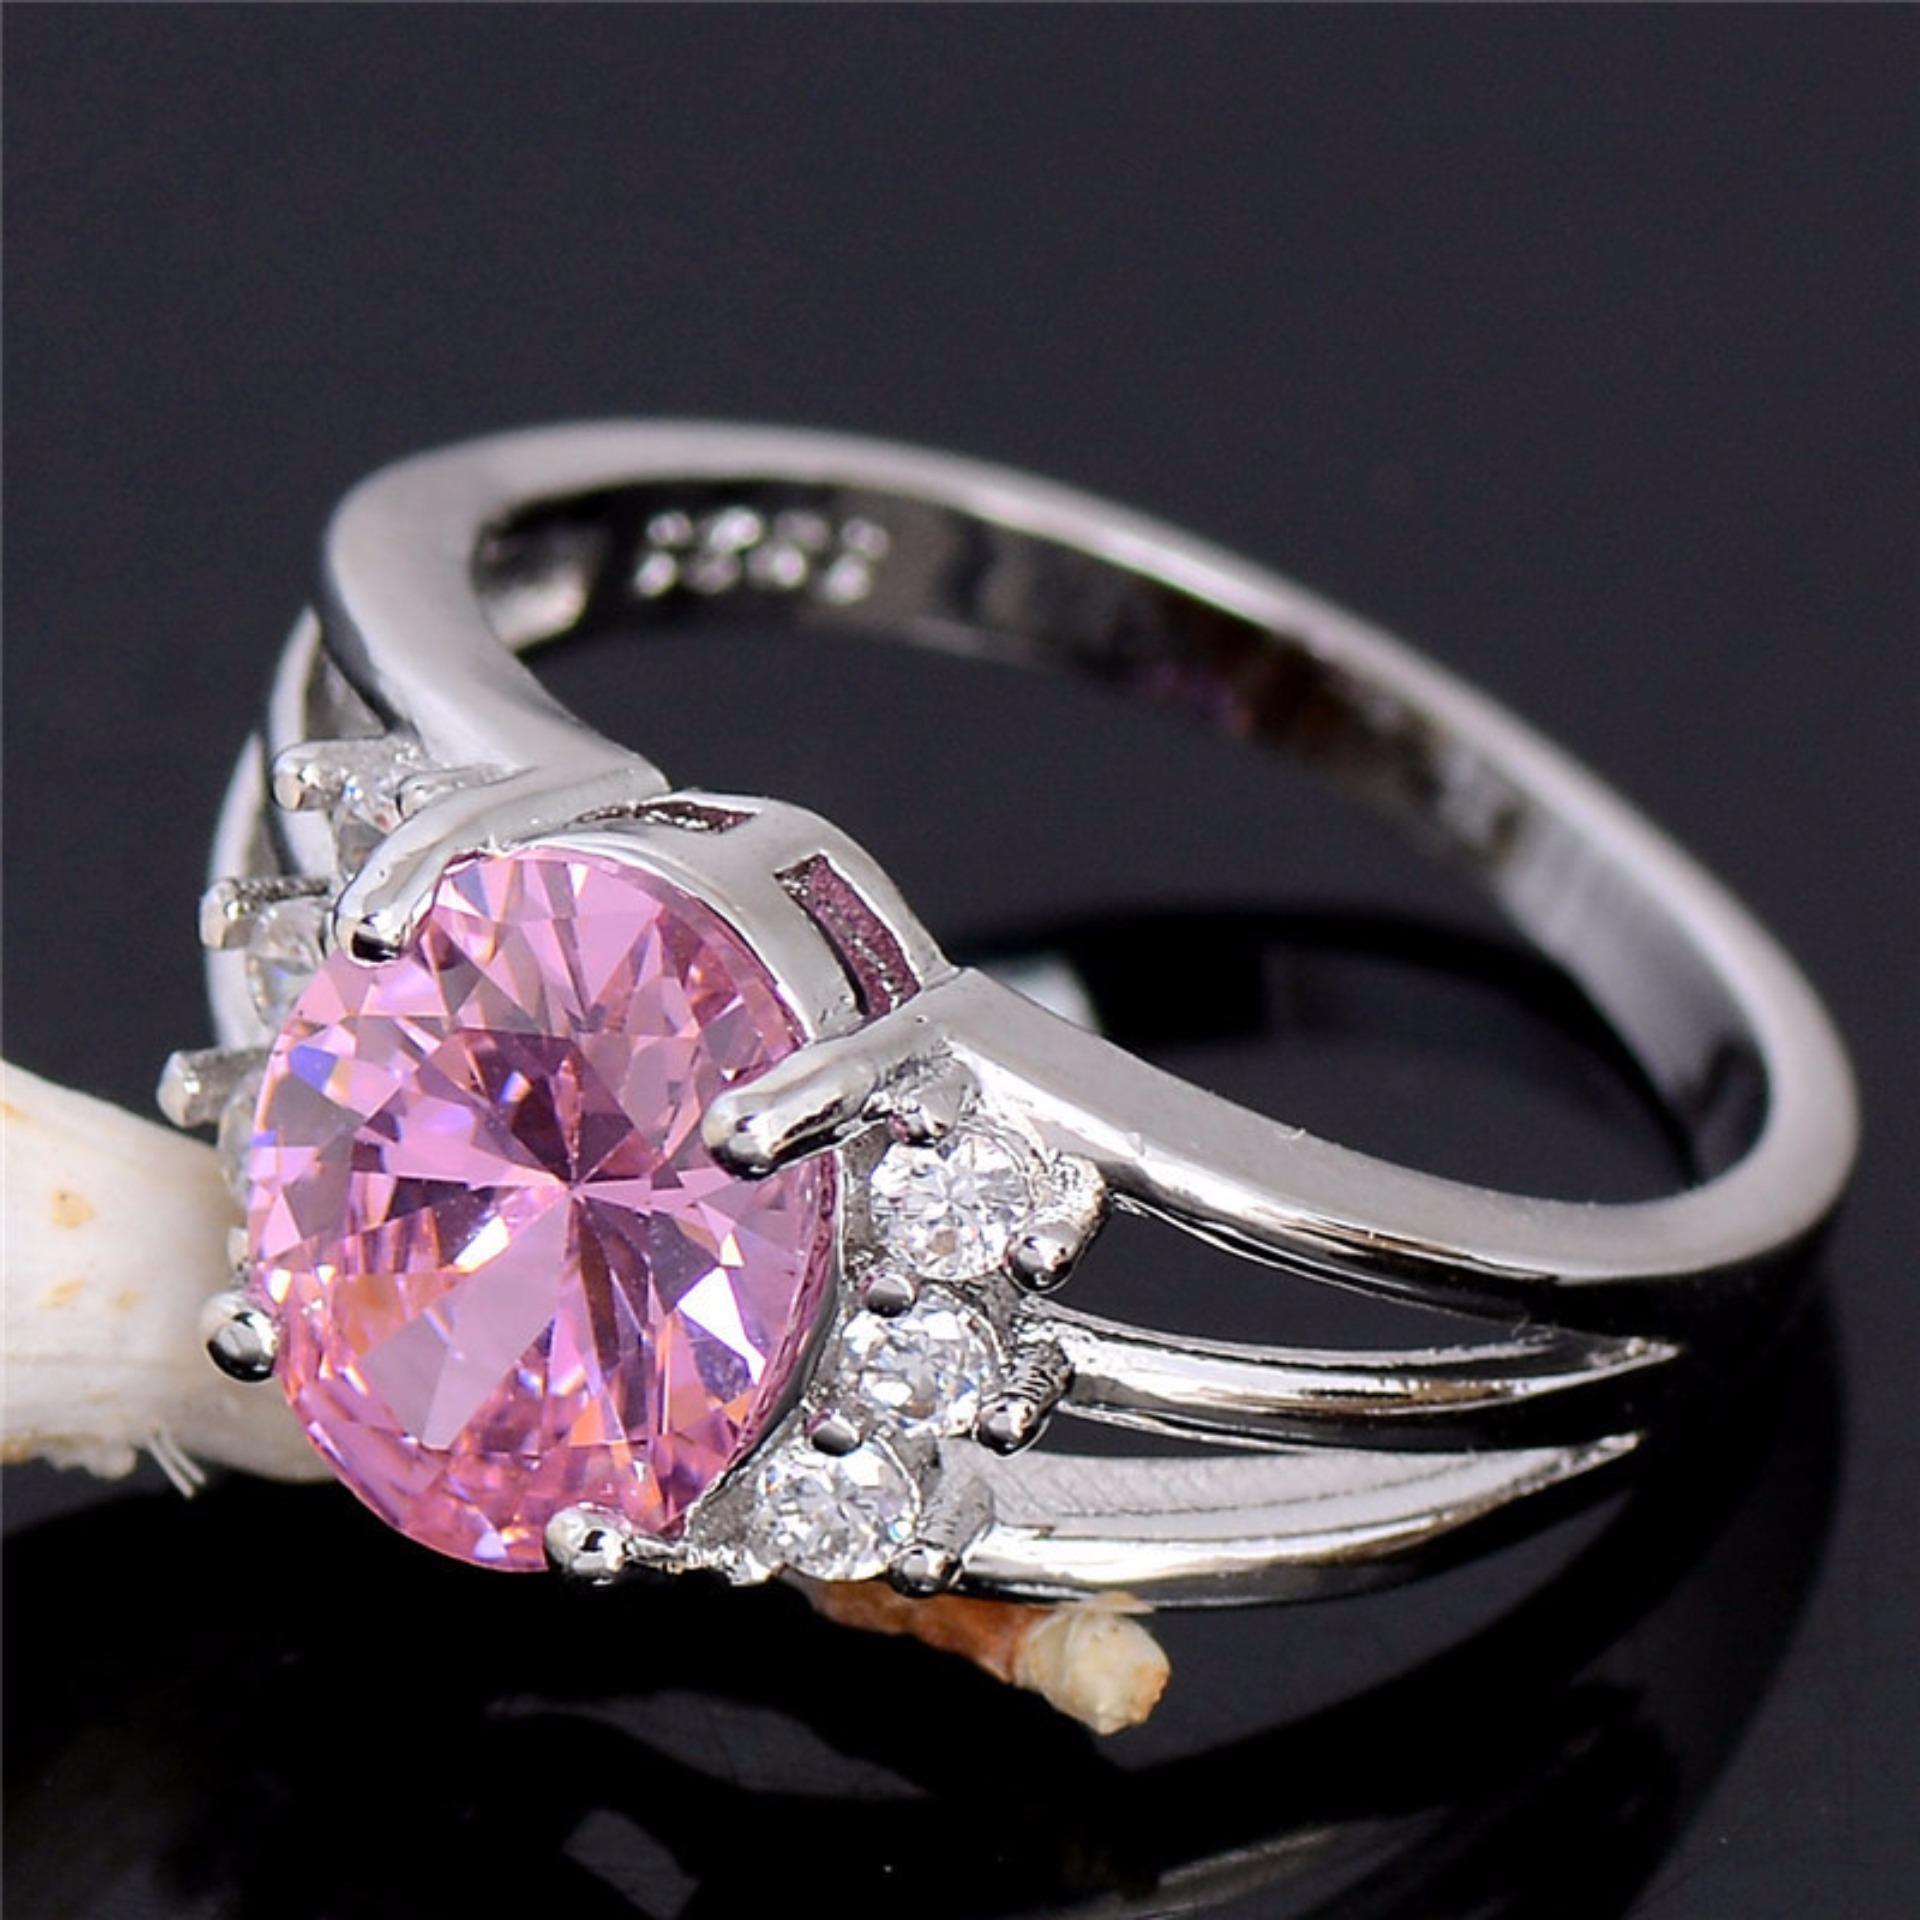 Cincin Silver Lapis Emas Putih Batu Pink Oval Berlian Imitasi Mewah Di Yogyakarta Diskon 50